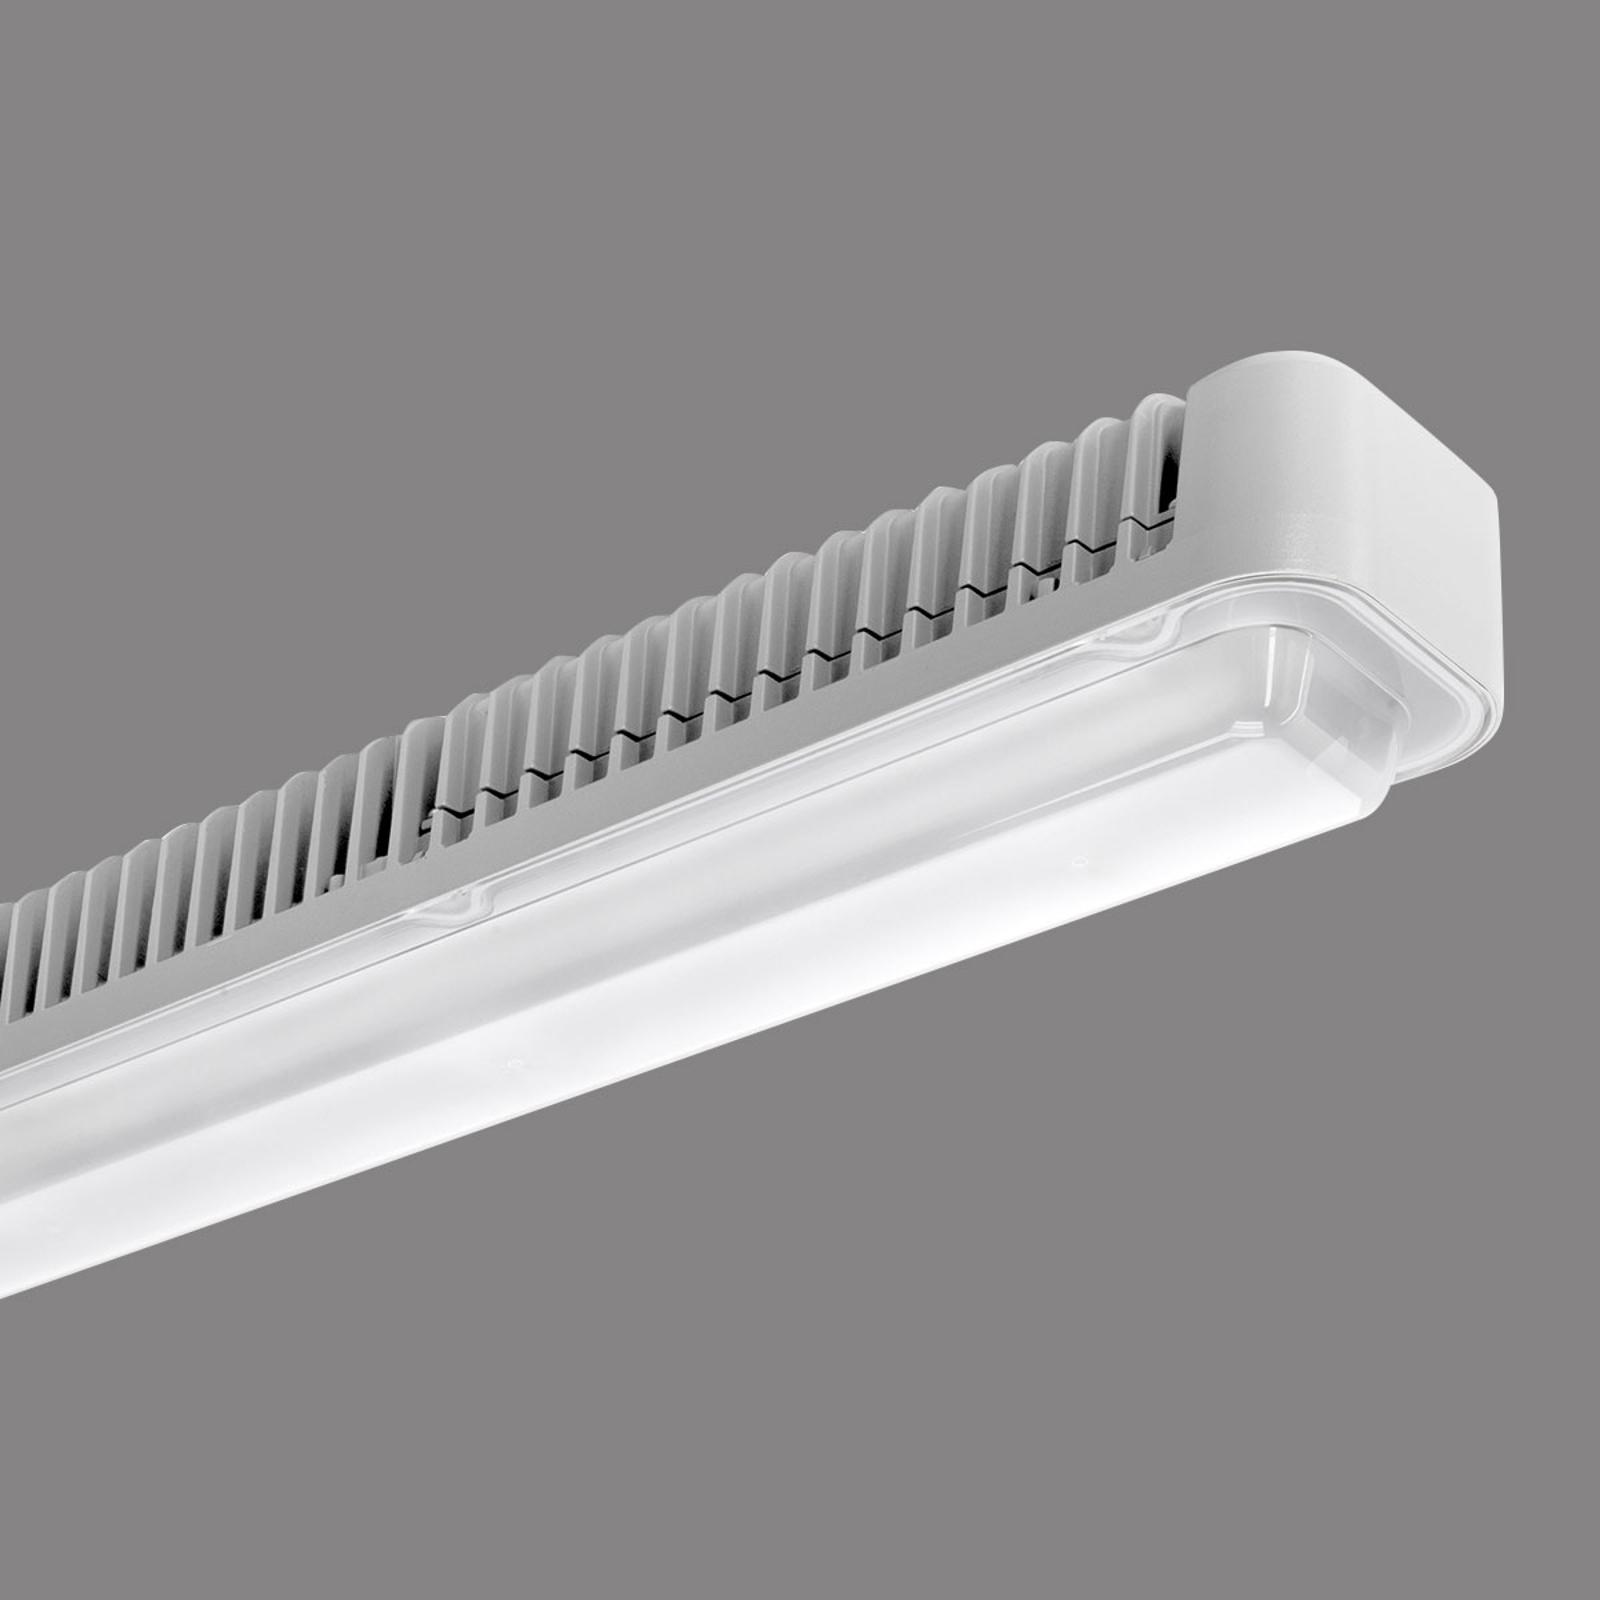 Lampa sufitowa LED Koa Line STR/PC S/EW LED 56W